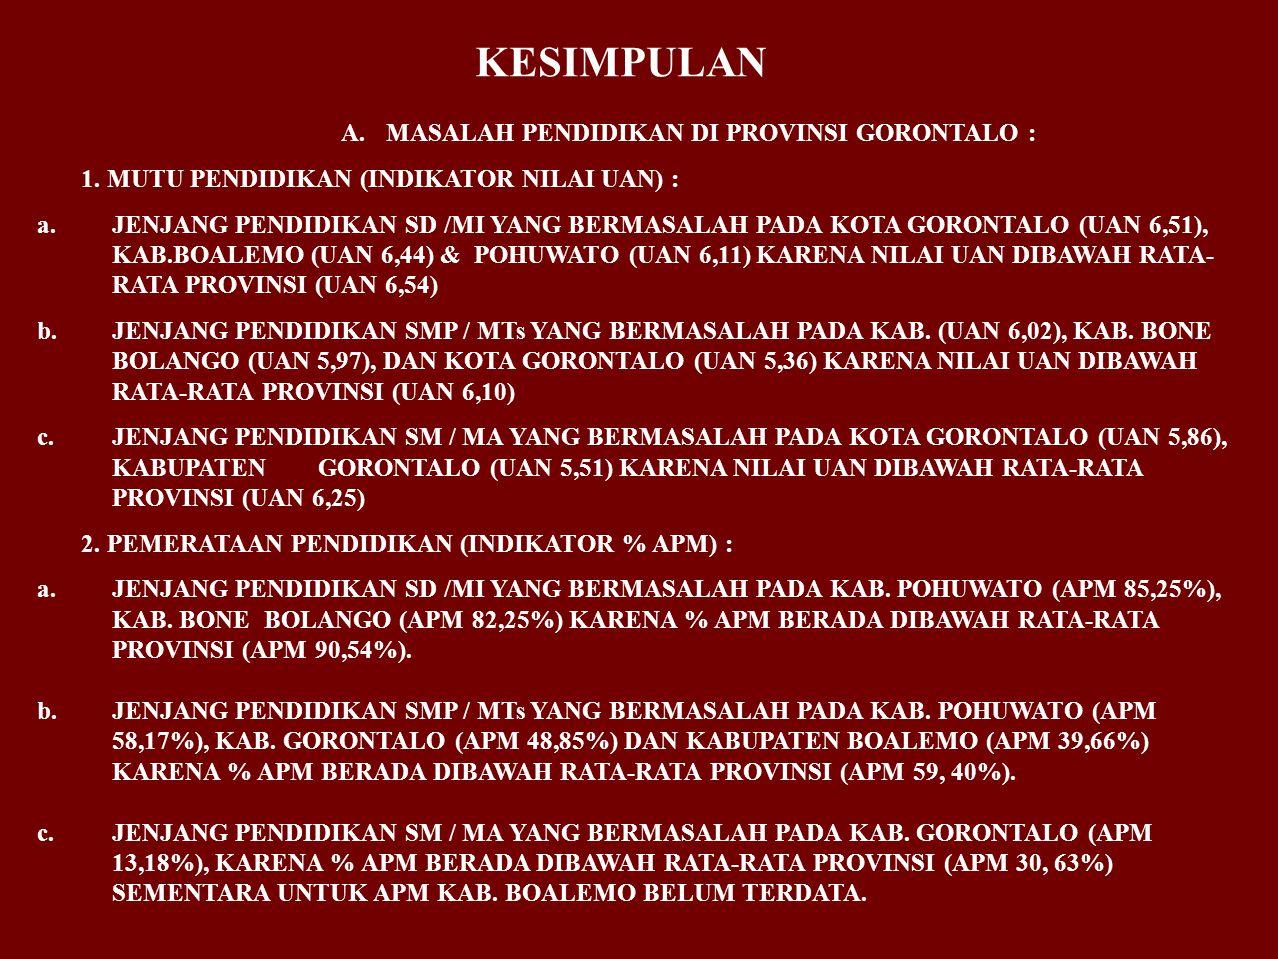 A.MASALAH PENDIDIKAN DI PROVINSI GORONTALO : 1. MUTU PENDIDIKAN (INDIKATOR NILAI UAN) : a.JENJANG PENDIDIKAN SD /MI YANG BERMASALAH PADA KOTA GORONTAL